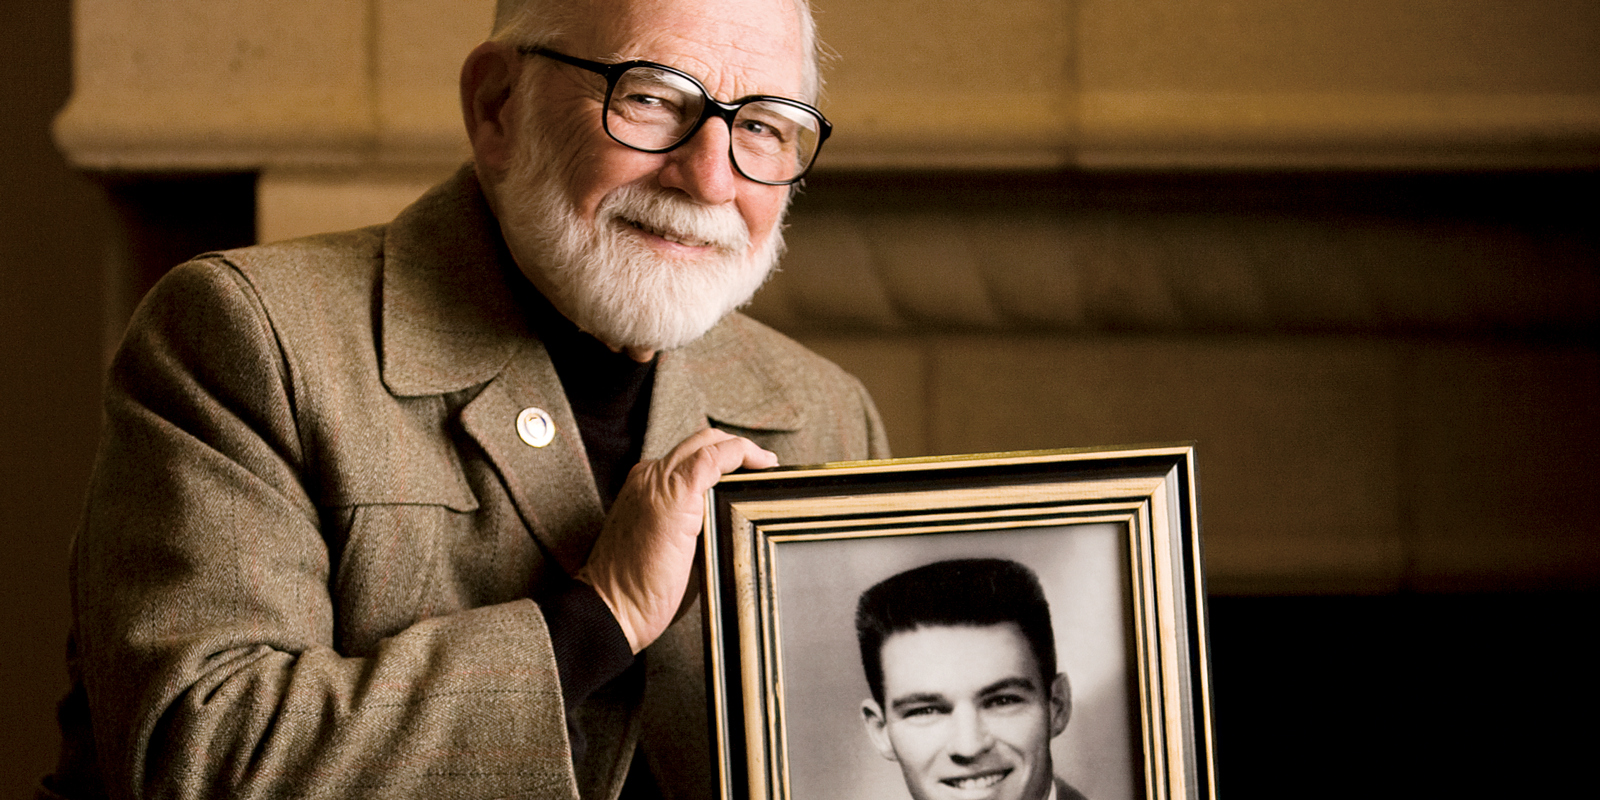 USD alumnus John Bowman